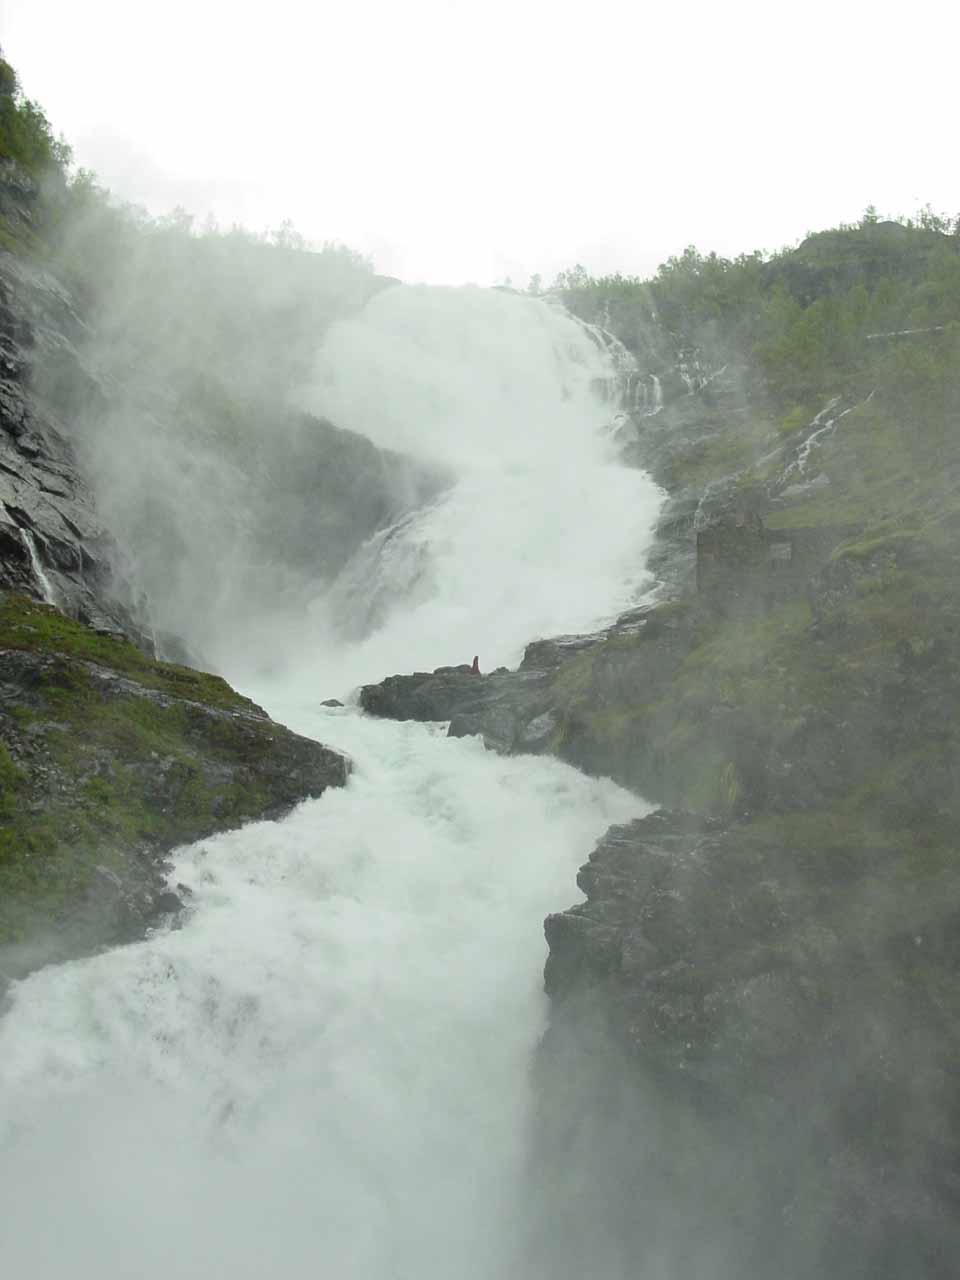 Kjosfossen in Flåmsdalen